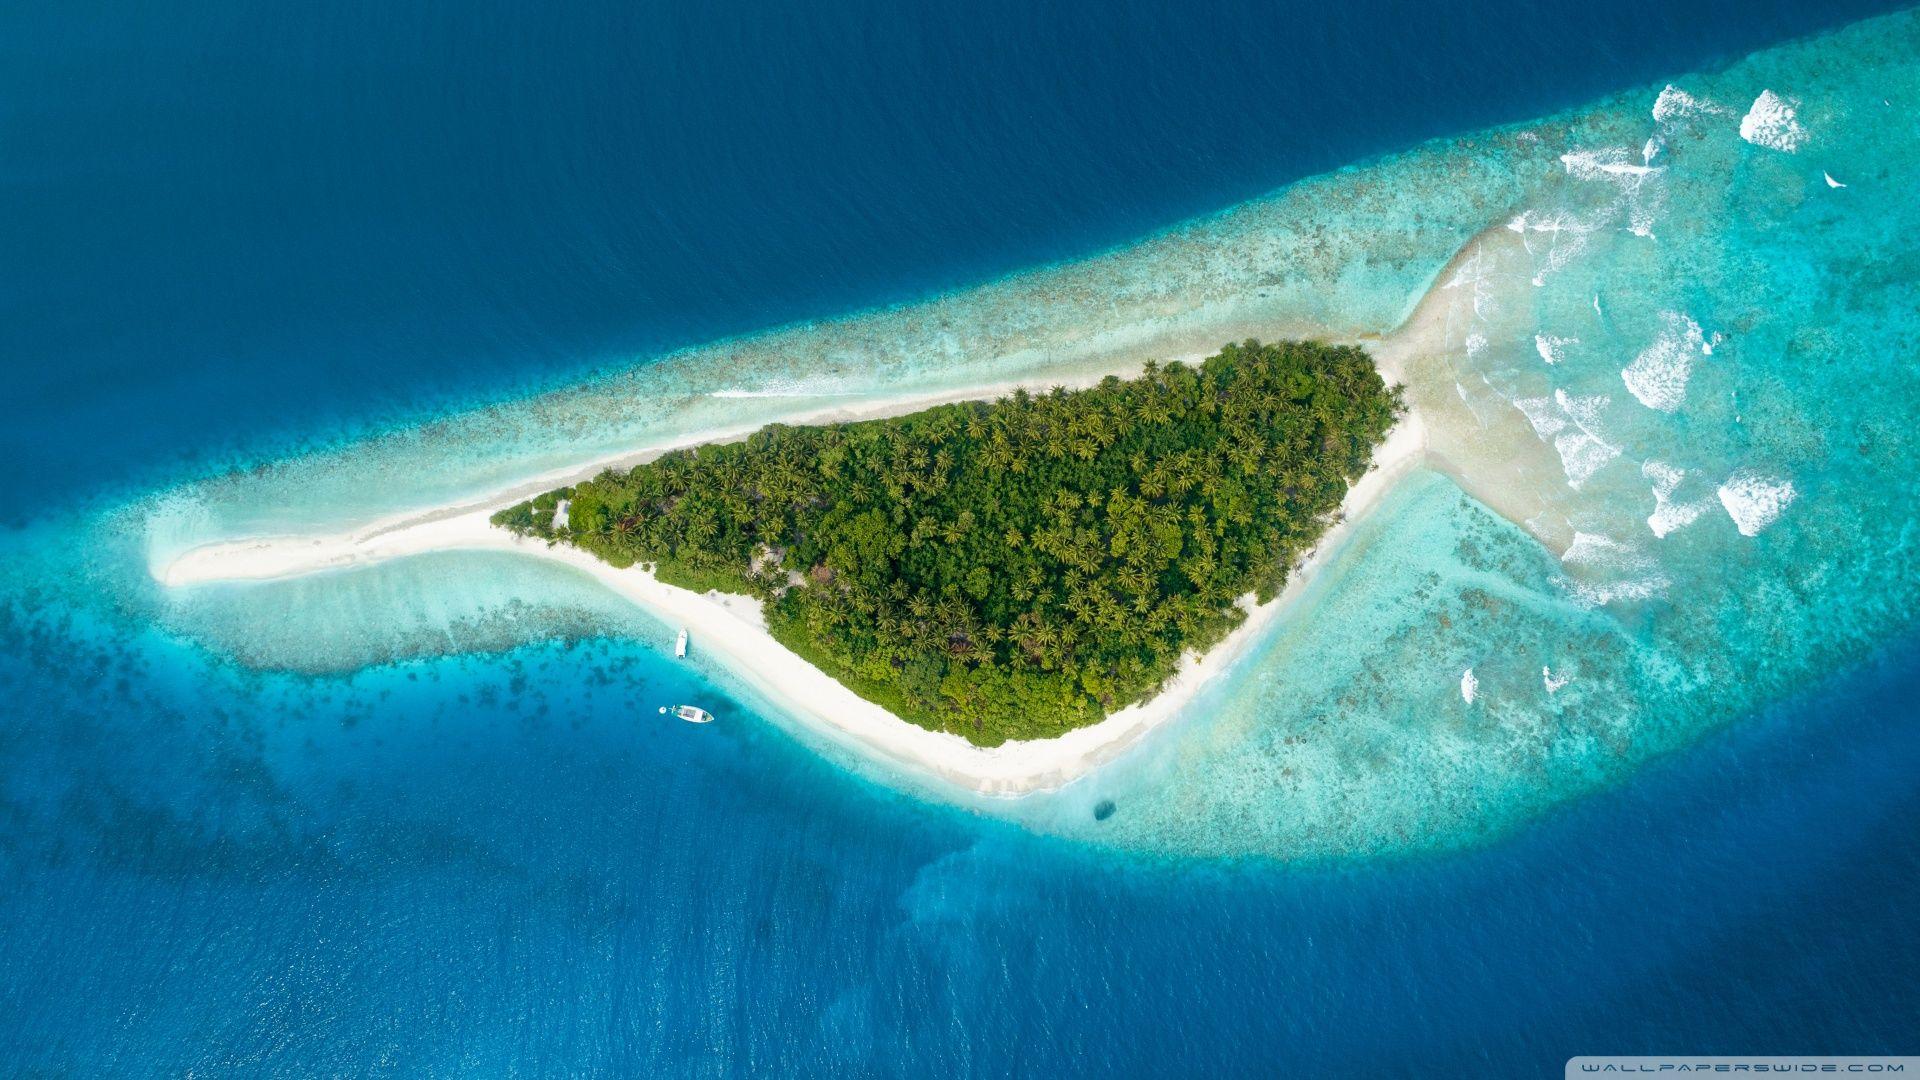 Maldive Fish Island Aerial Photography Hd Wallpaper 1920x1080